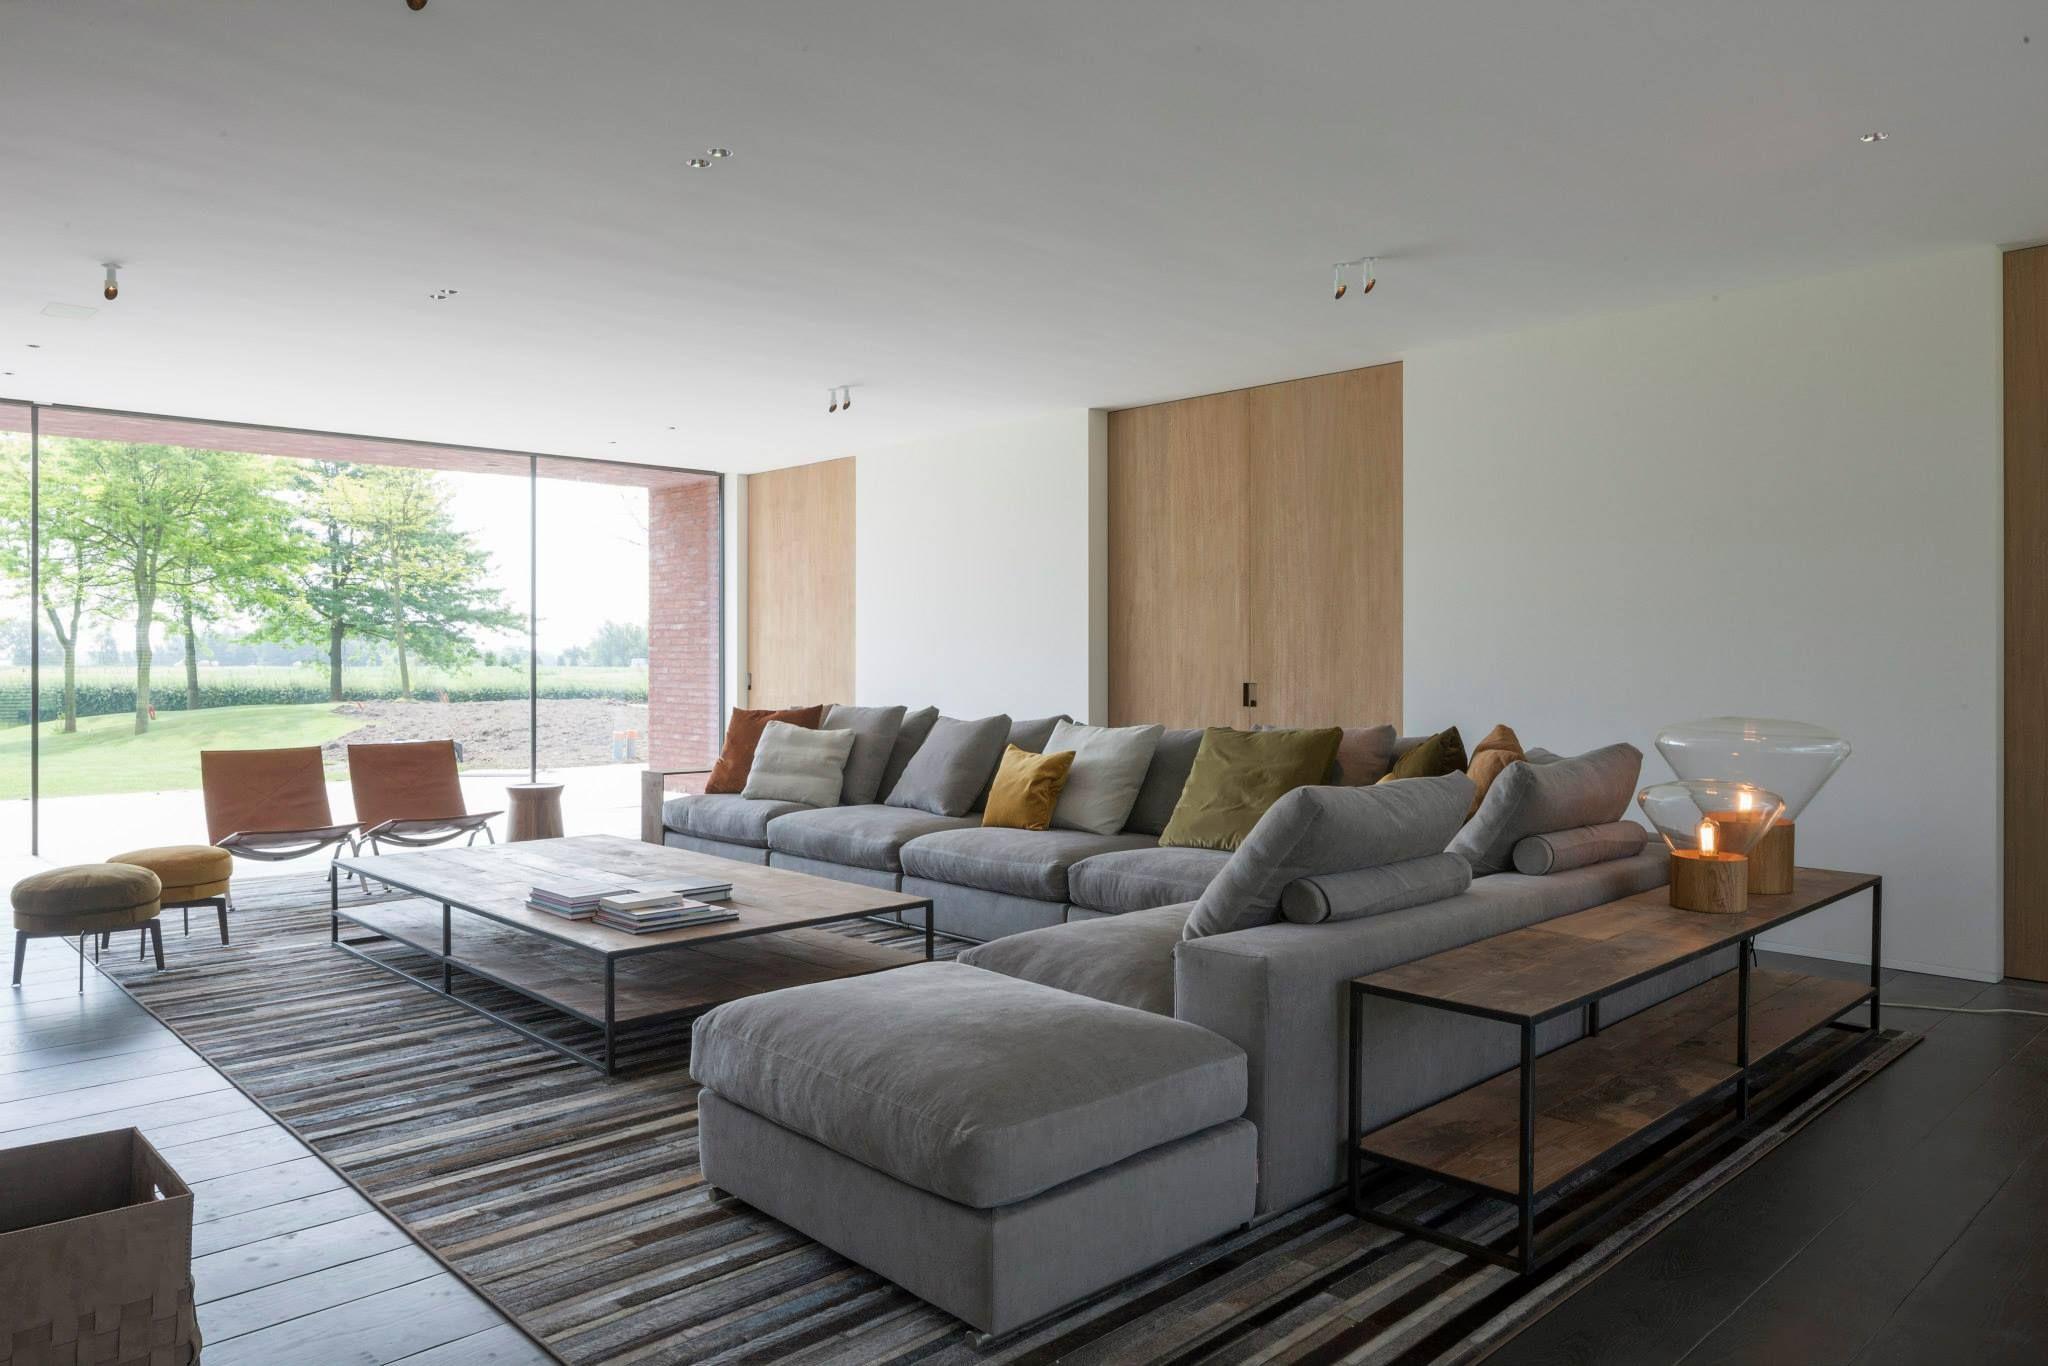 living - canapé ❤️ (con imágenes)  Decoración hogar